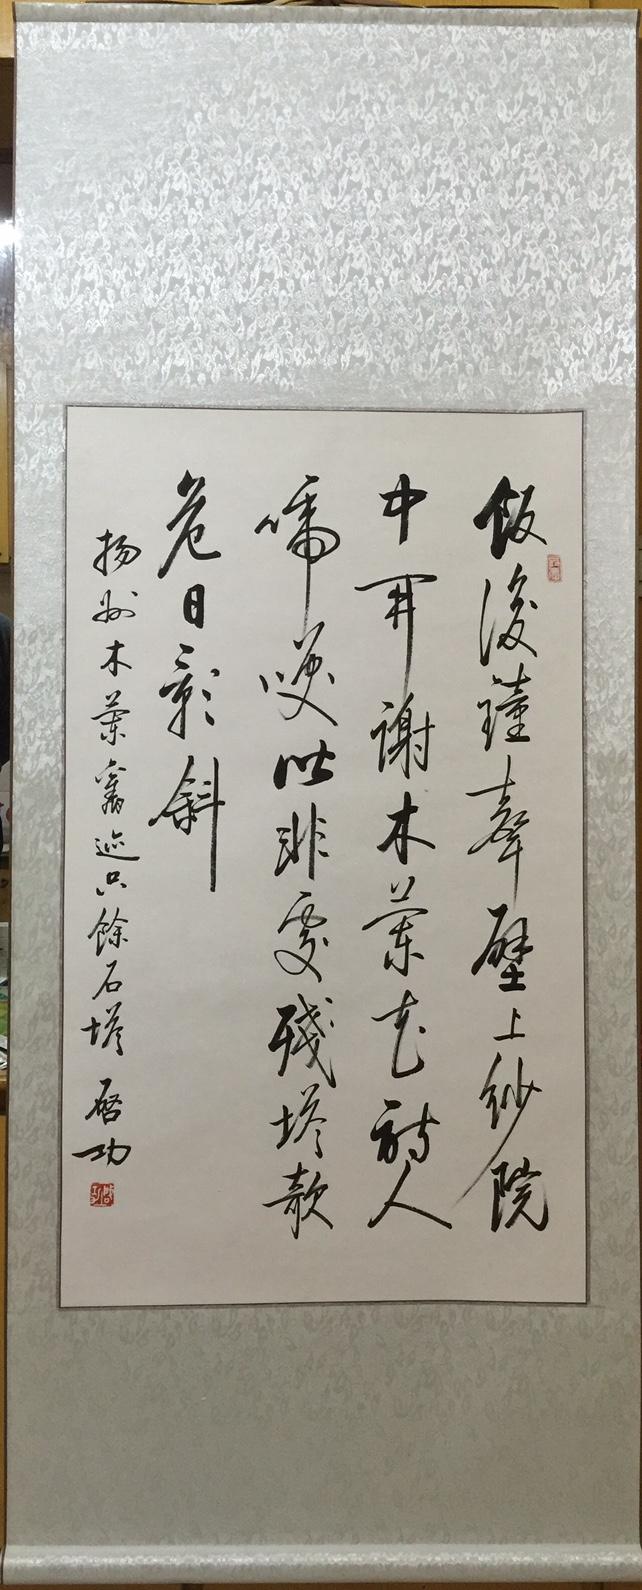 Qi Gong(1912-2005), Calligraphy